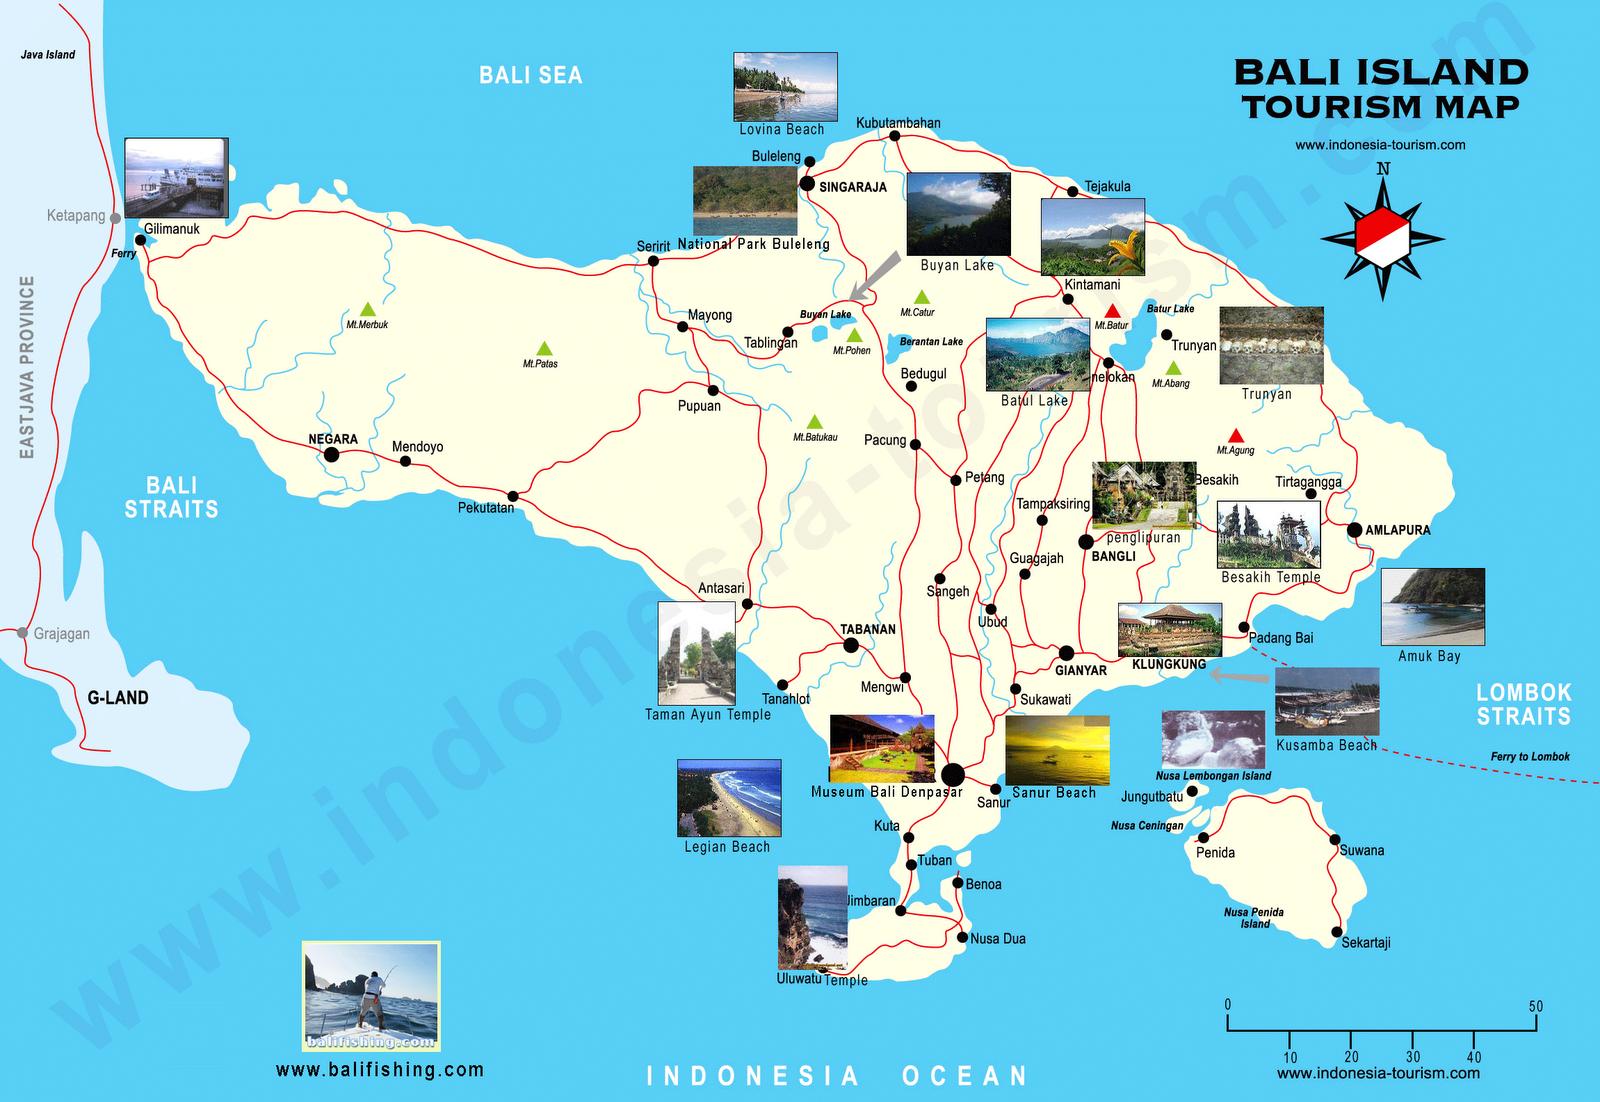 Pulau Bali Map Maps Tourism in Bali